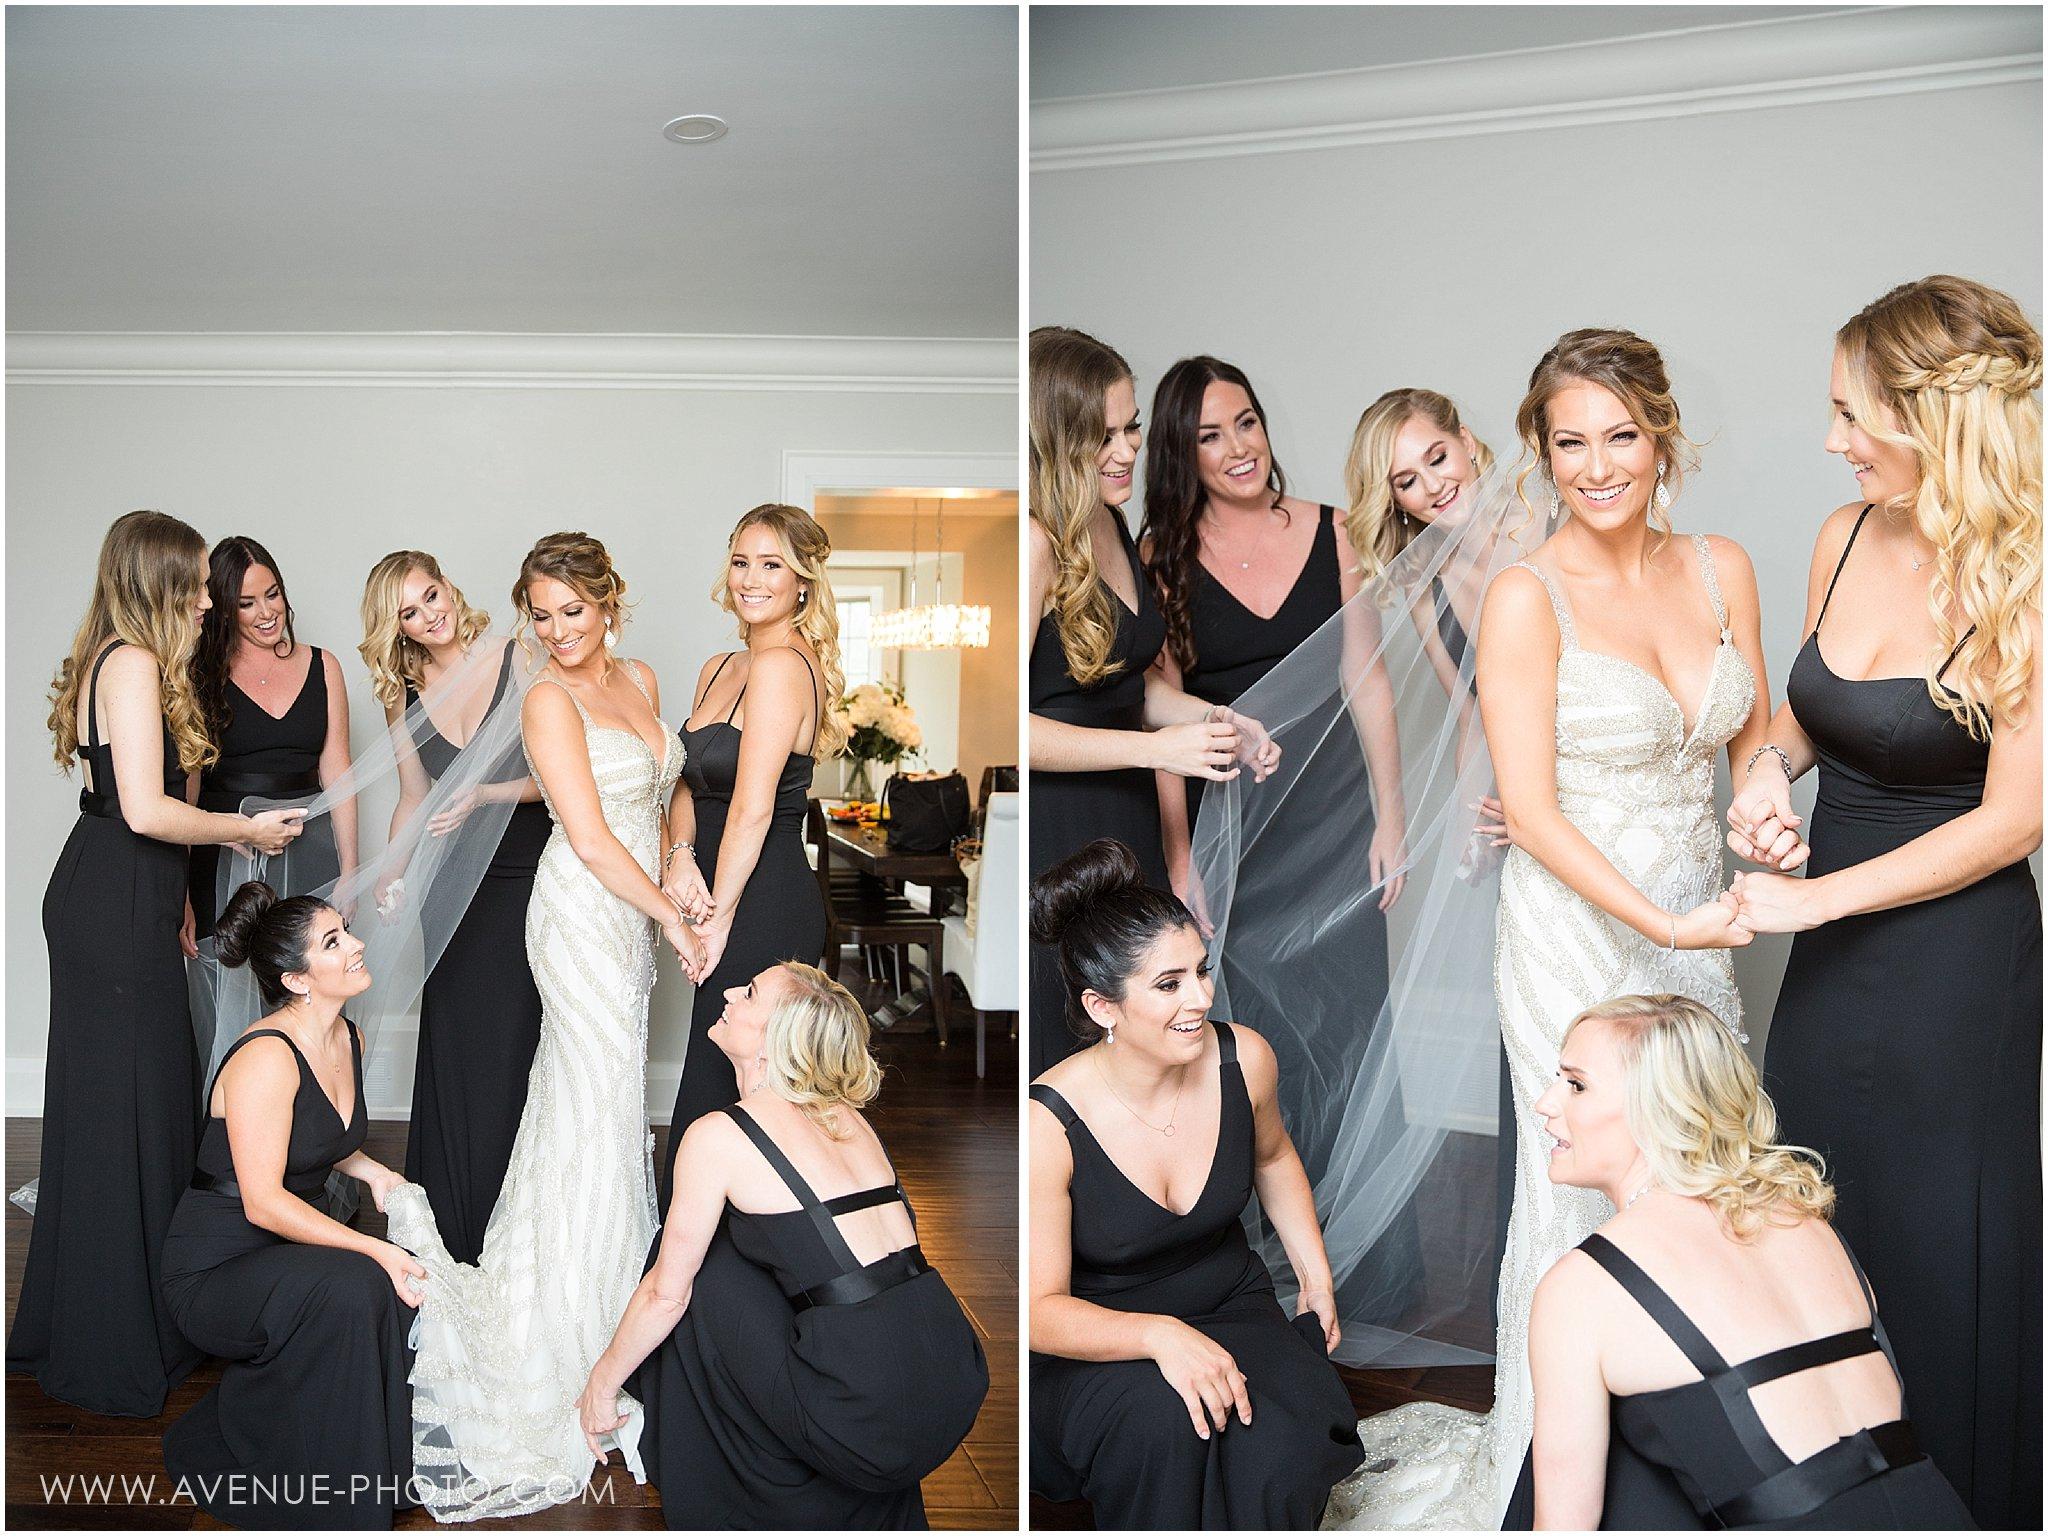 Crystal Ballroom Wedding at King Edward Hotel, King Eddie Hotel Wedding, Metropolitan United Wedding, St James Gardens Wedding Photos, Toronto Wedding photographer, Avenue Photo